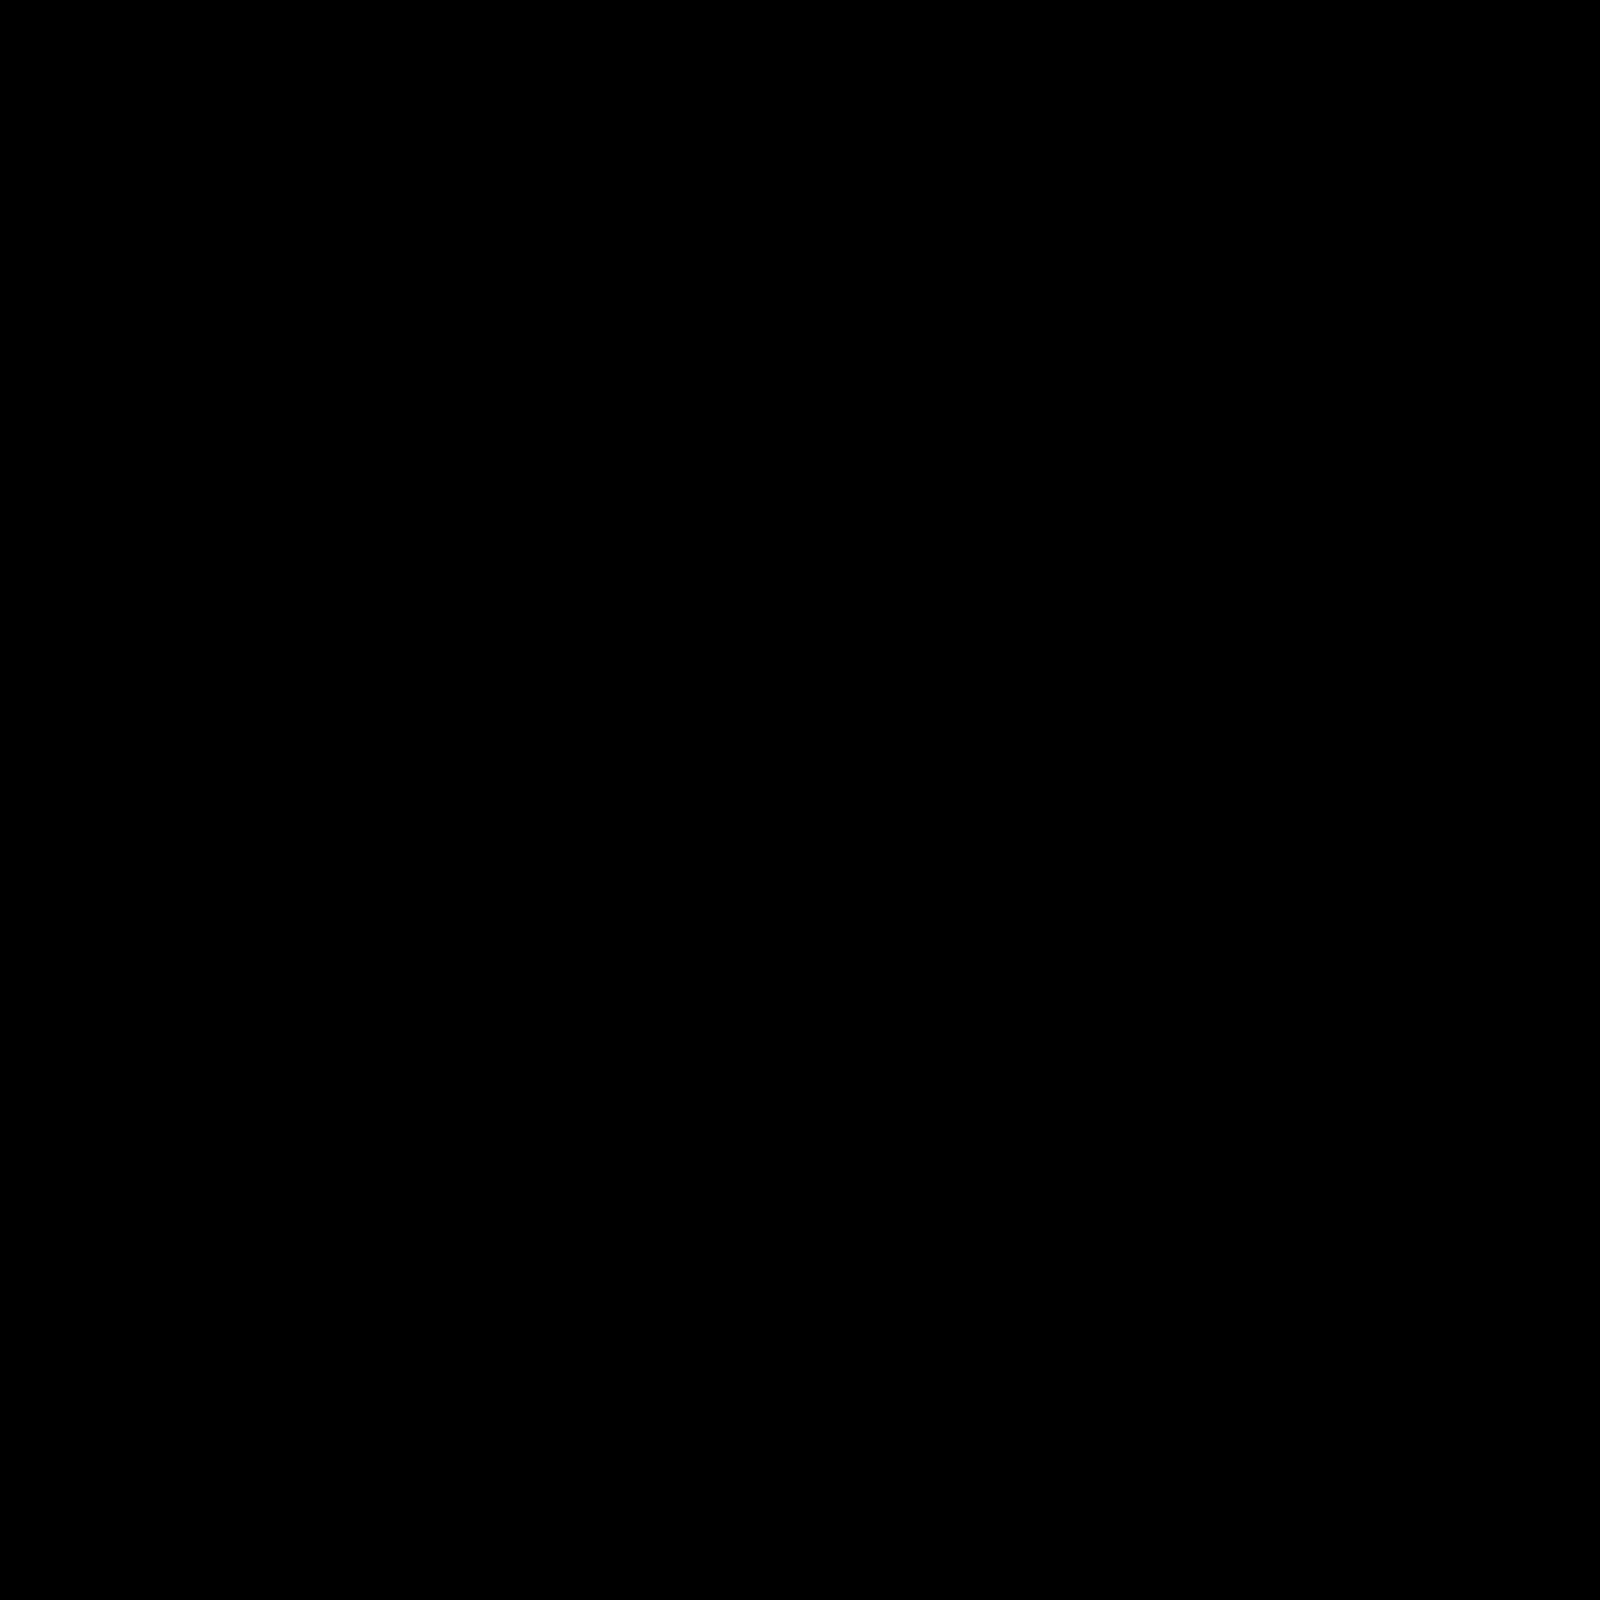 Rotary Inclinometer icon